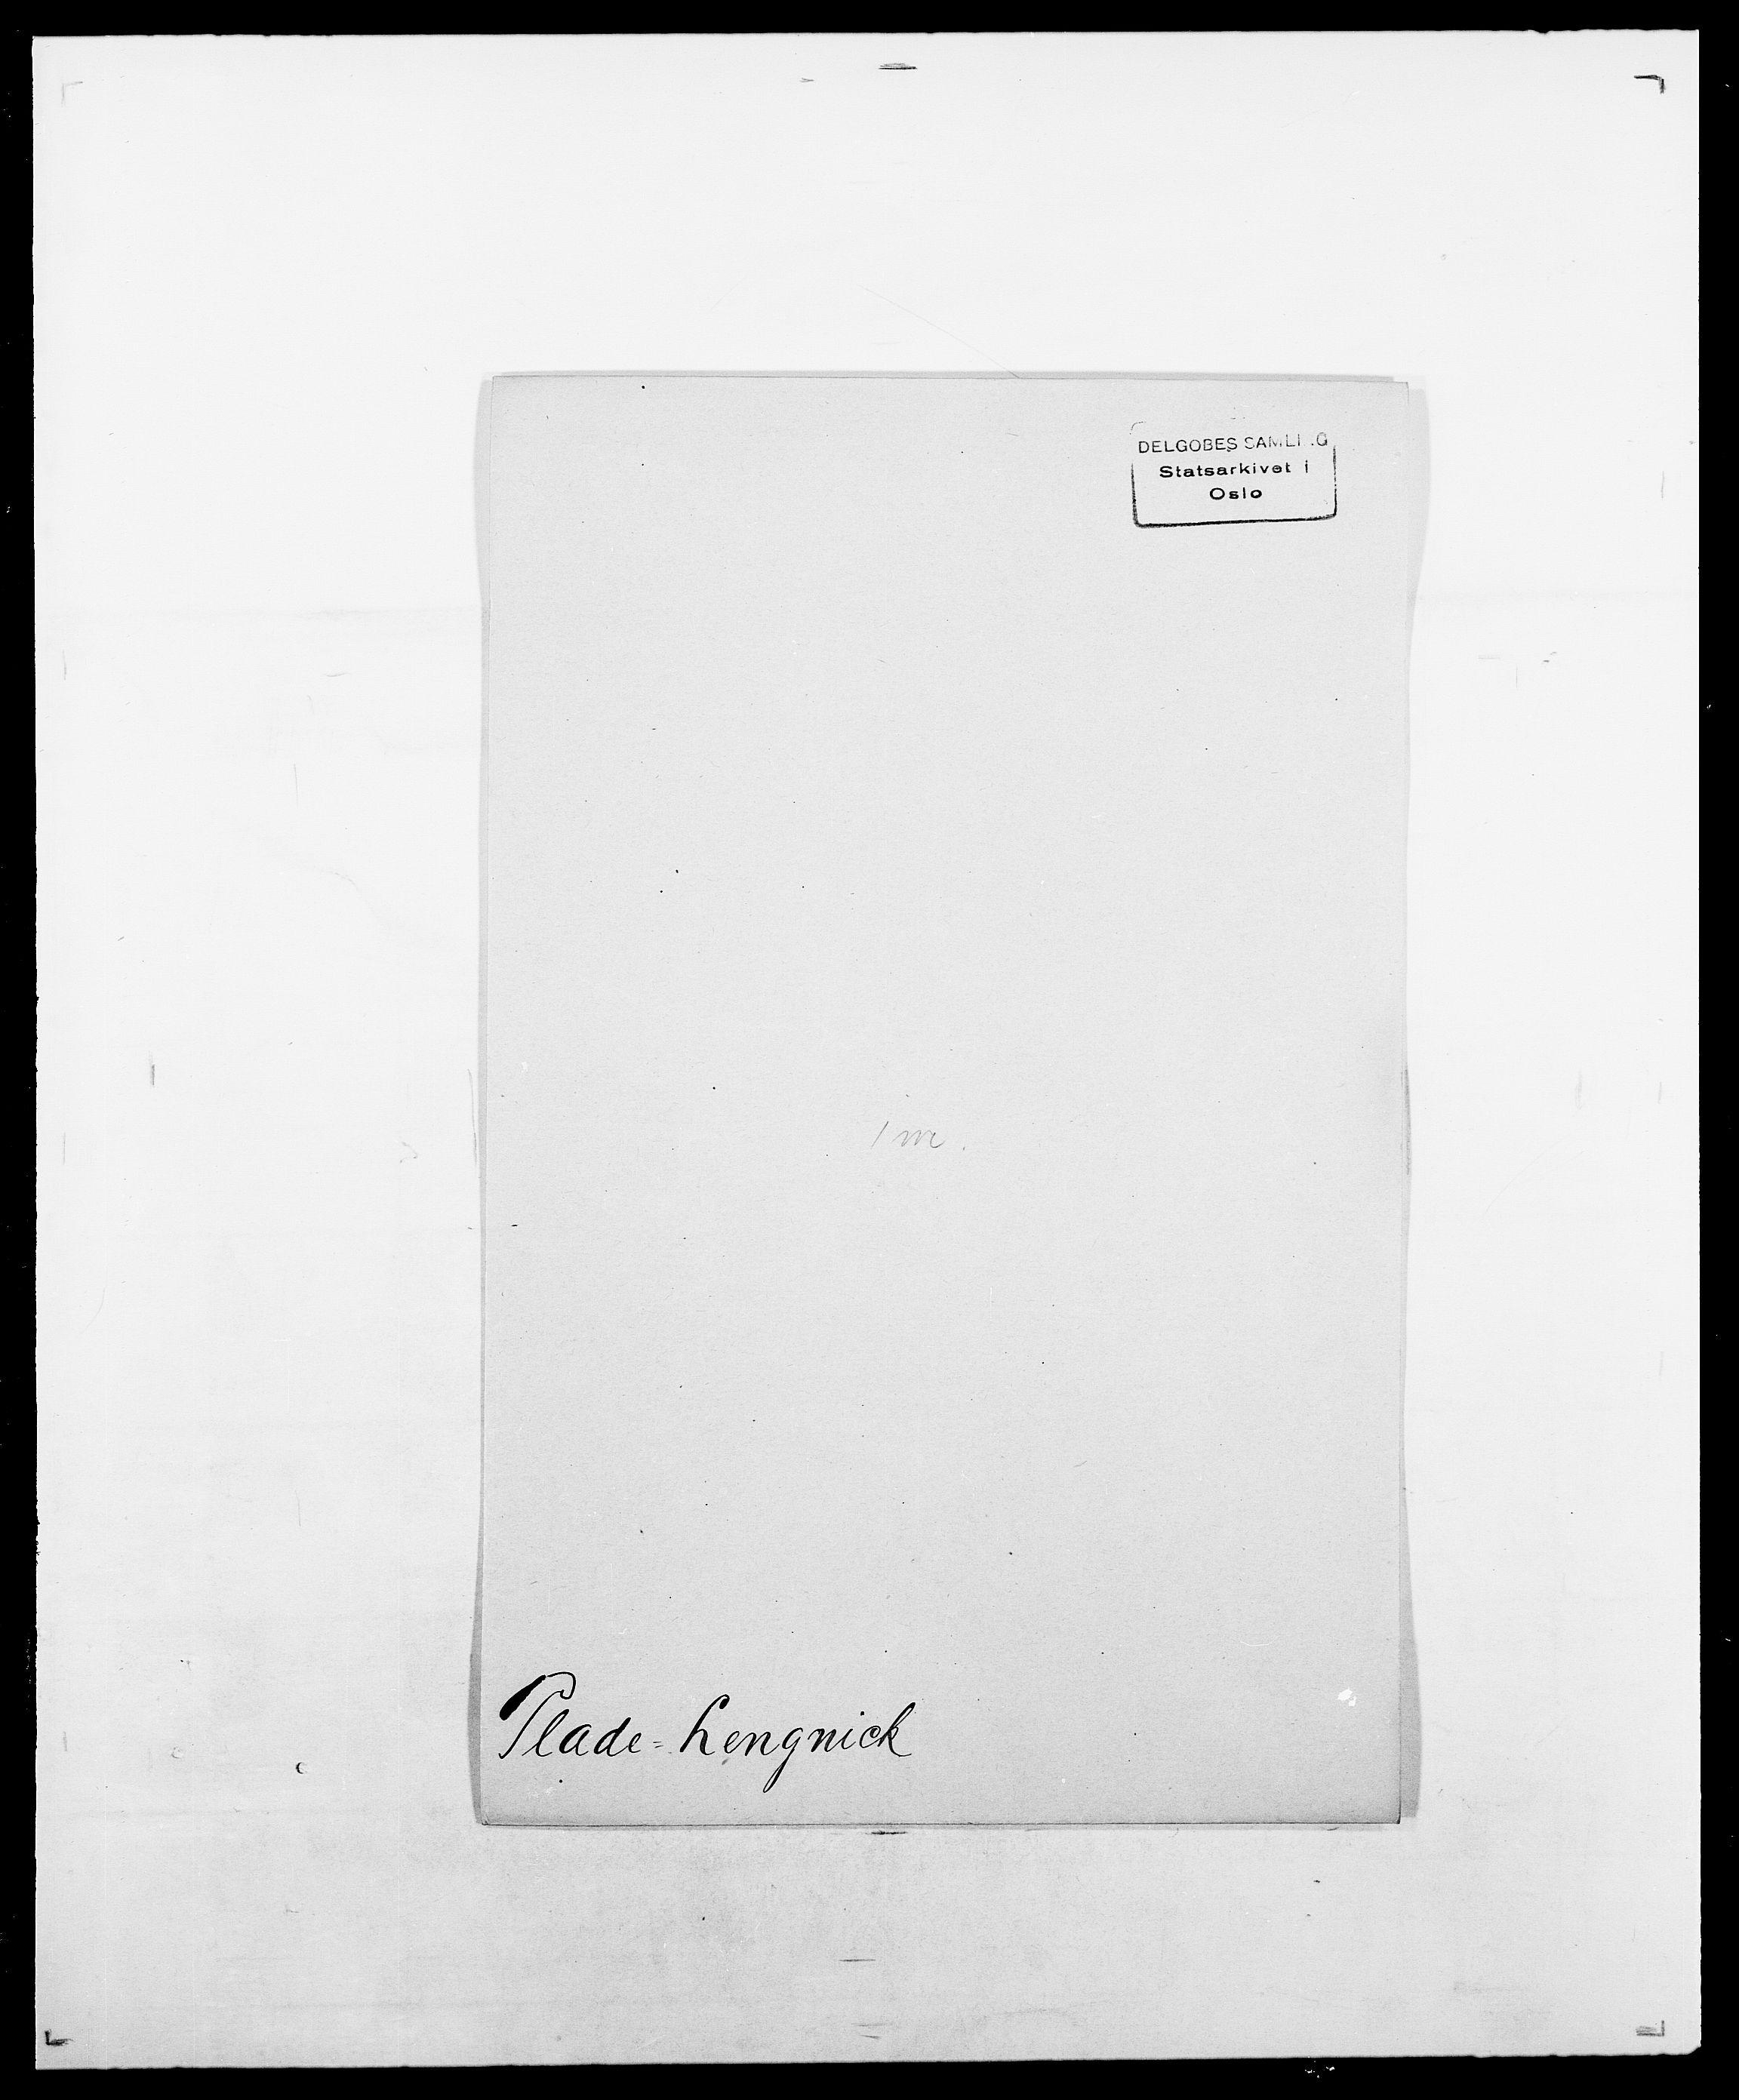 SAO, Delgobe, Charles Antoine - samling, D/Da/L0031: de Place - Raaum, s. 12